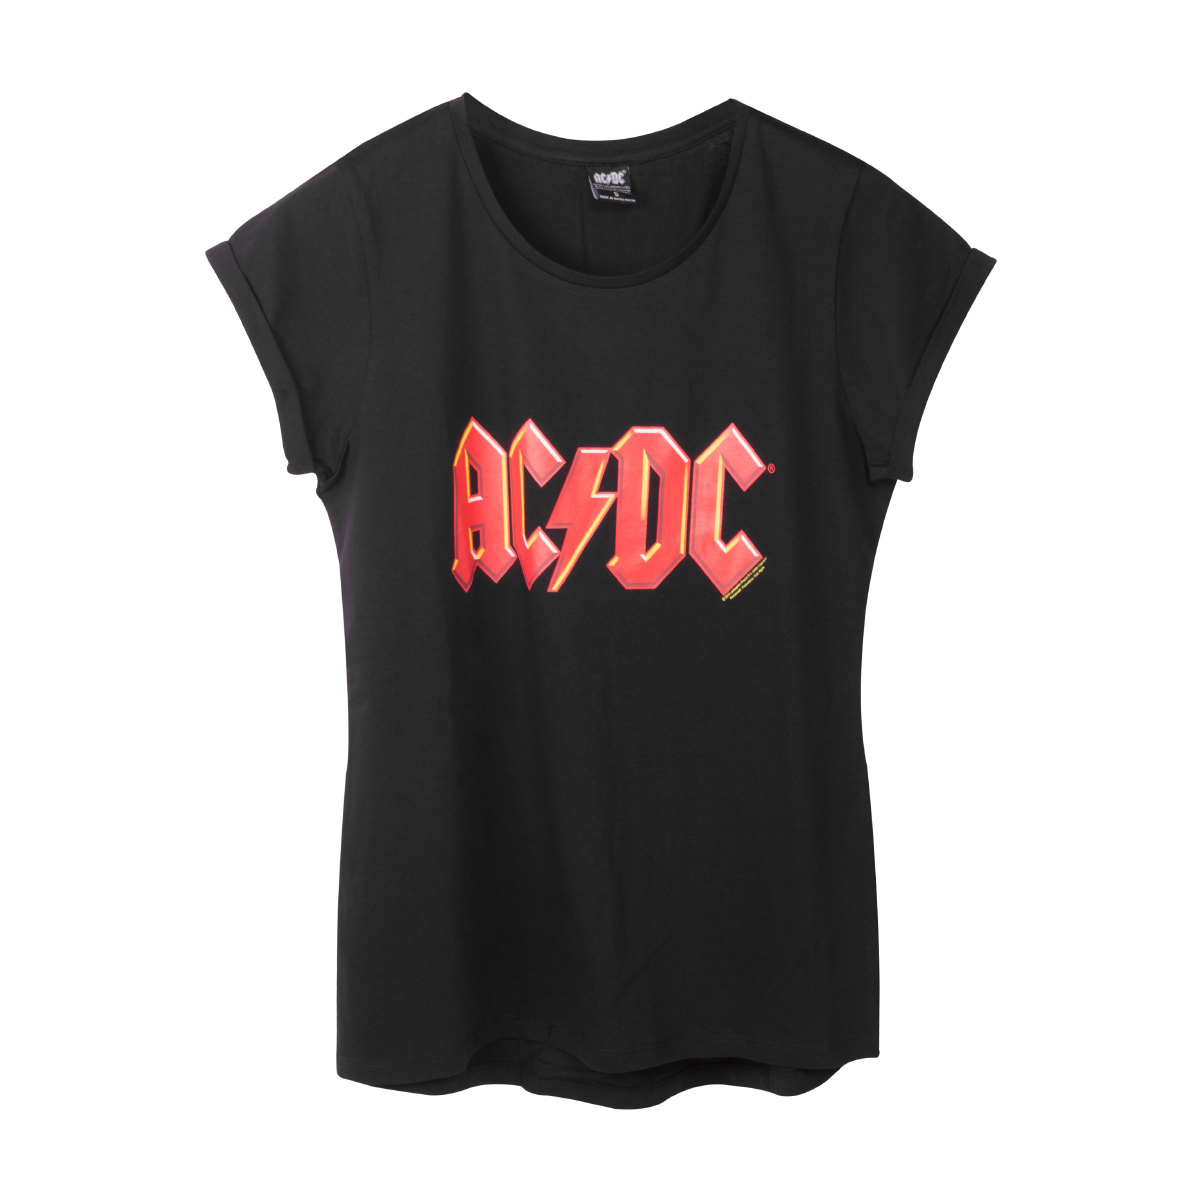 881a1326dc92 AC/DC Women's Red Lightning Logo T-Shirt | Shop the AC/DC Official ...